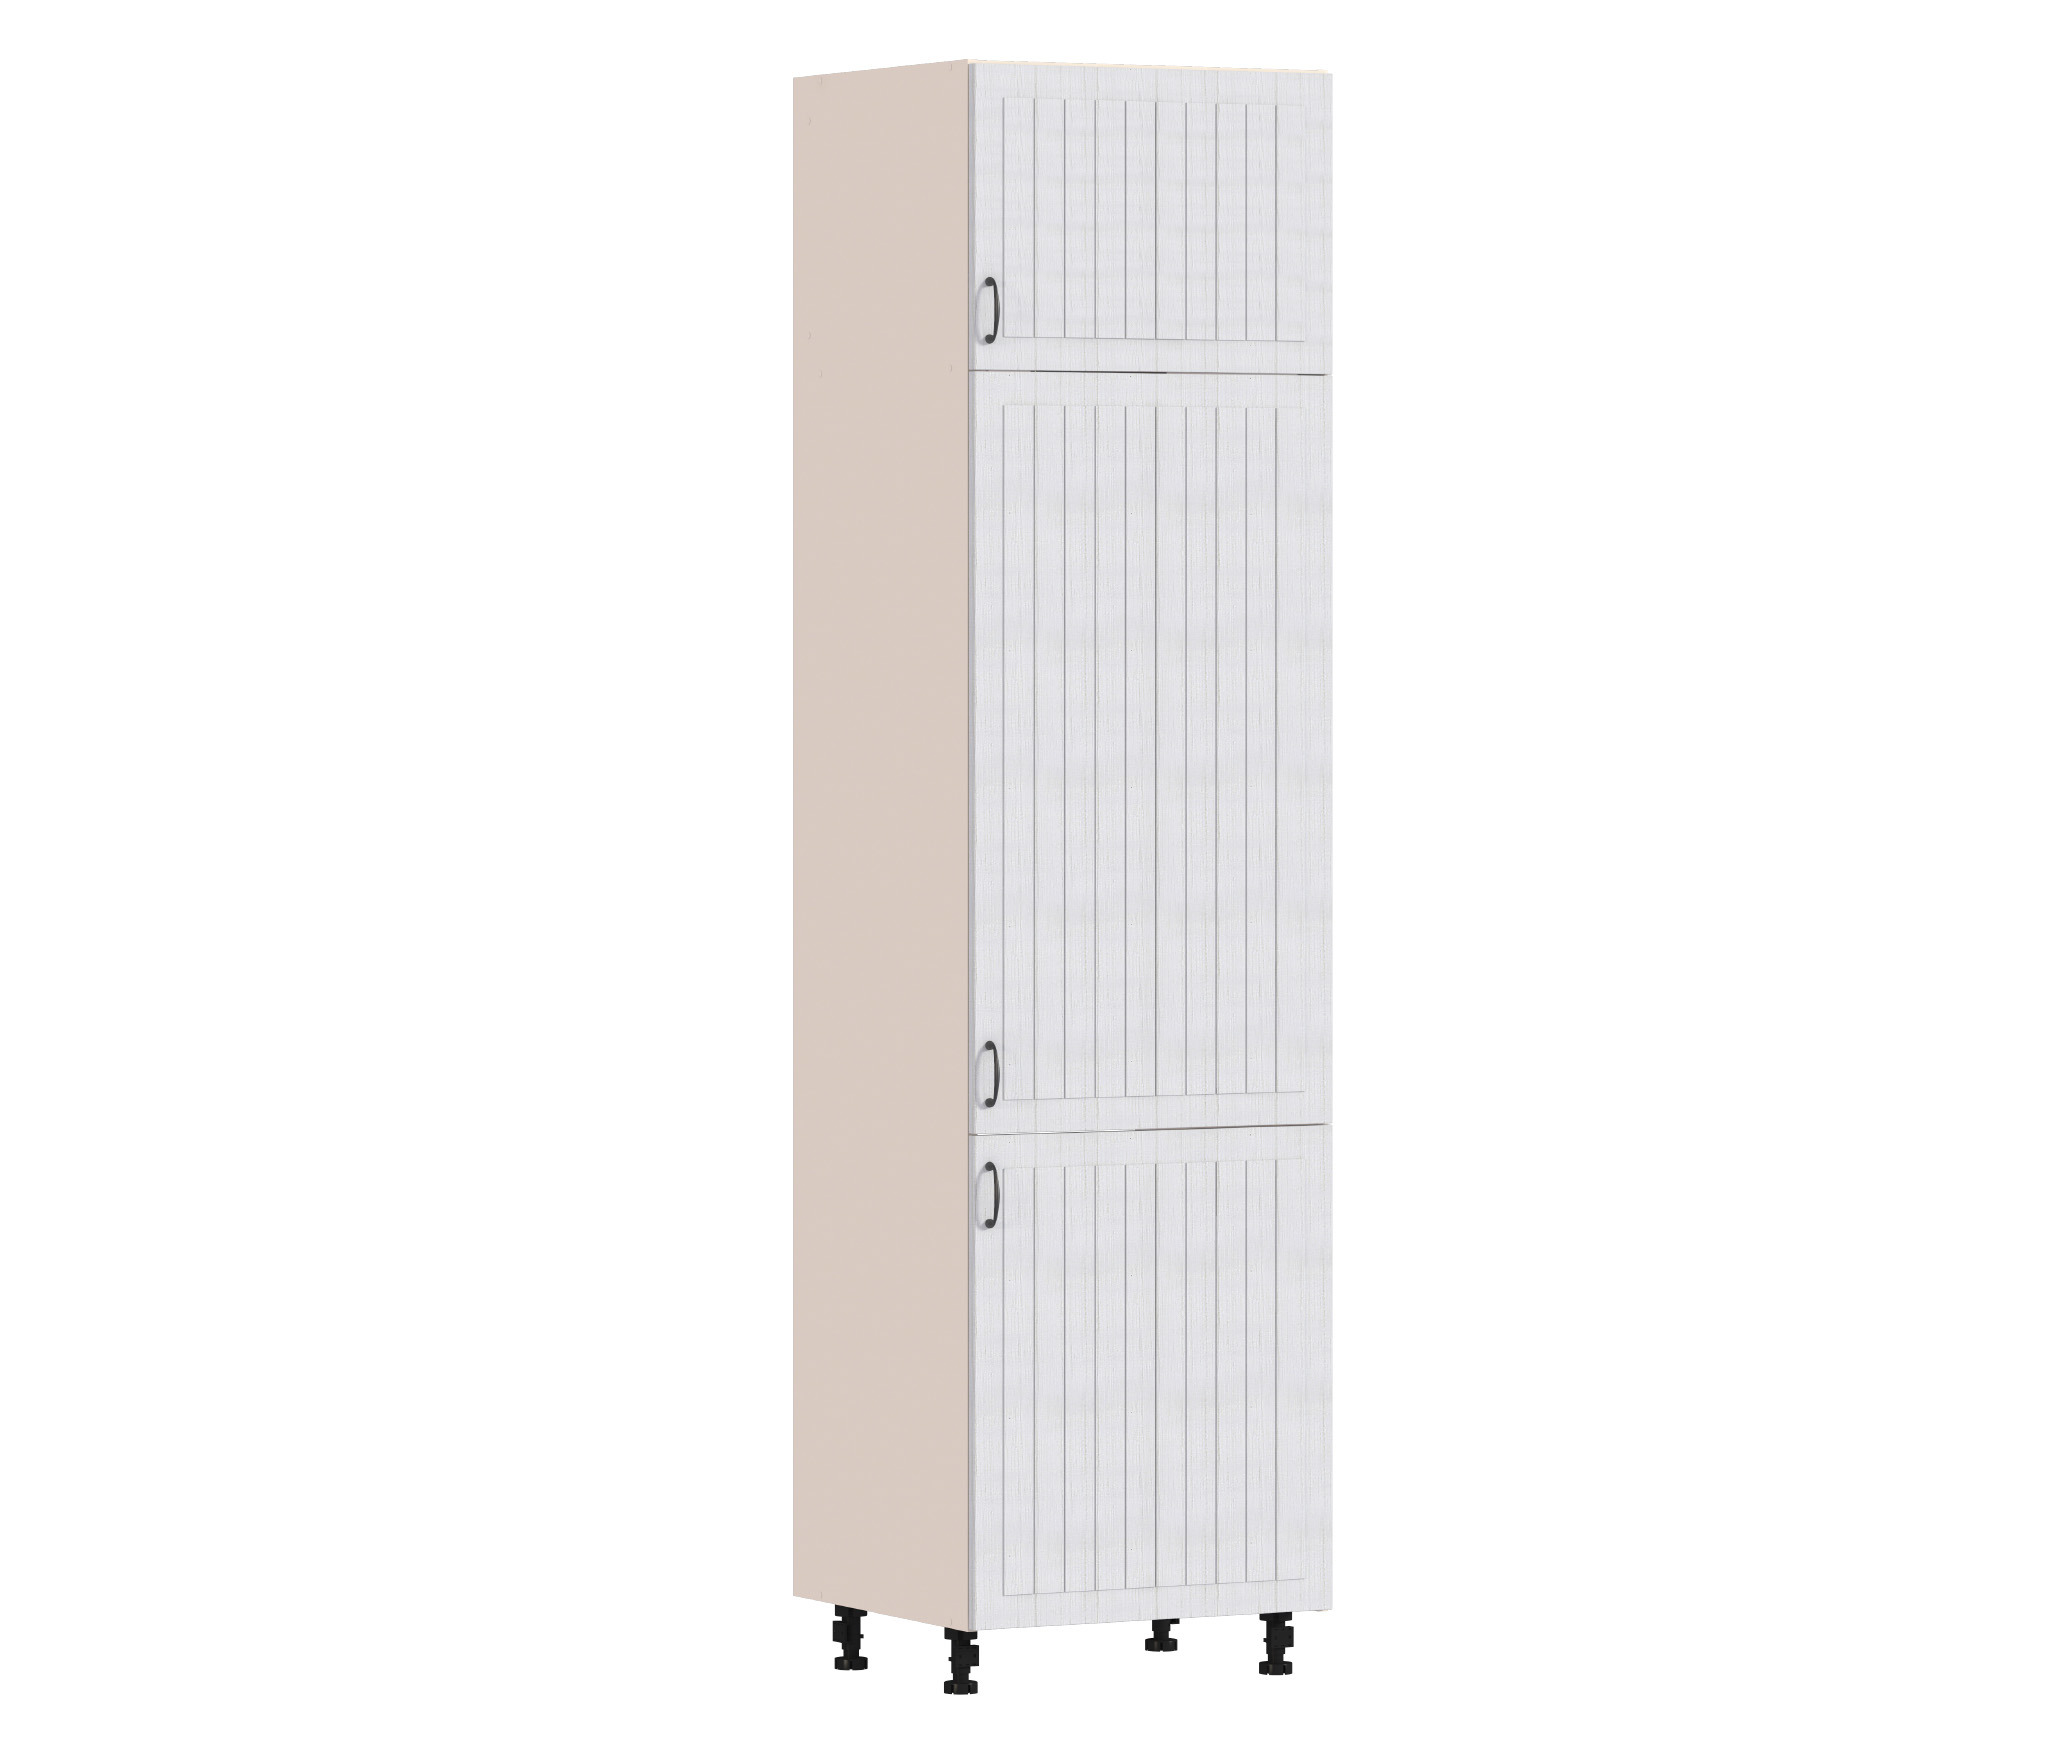 Регина РП-560 пеналМебель для кухни<br><br><br>Длина мм: 0<br>Высота мм: 0<br>Глубина мм: 0